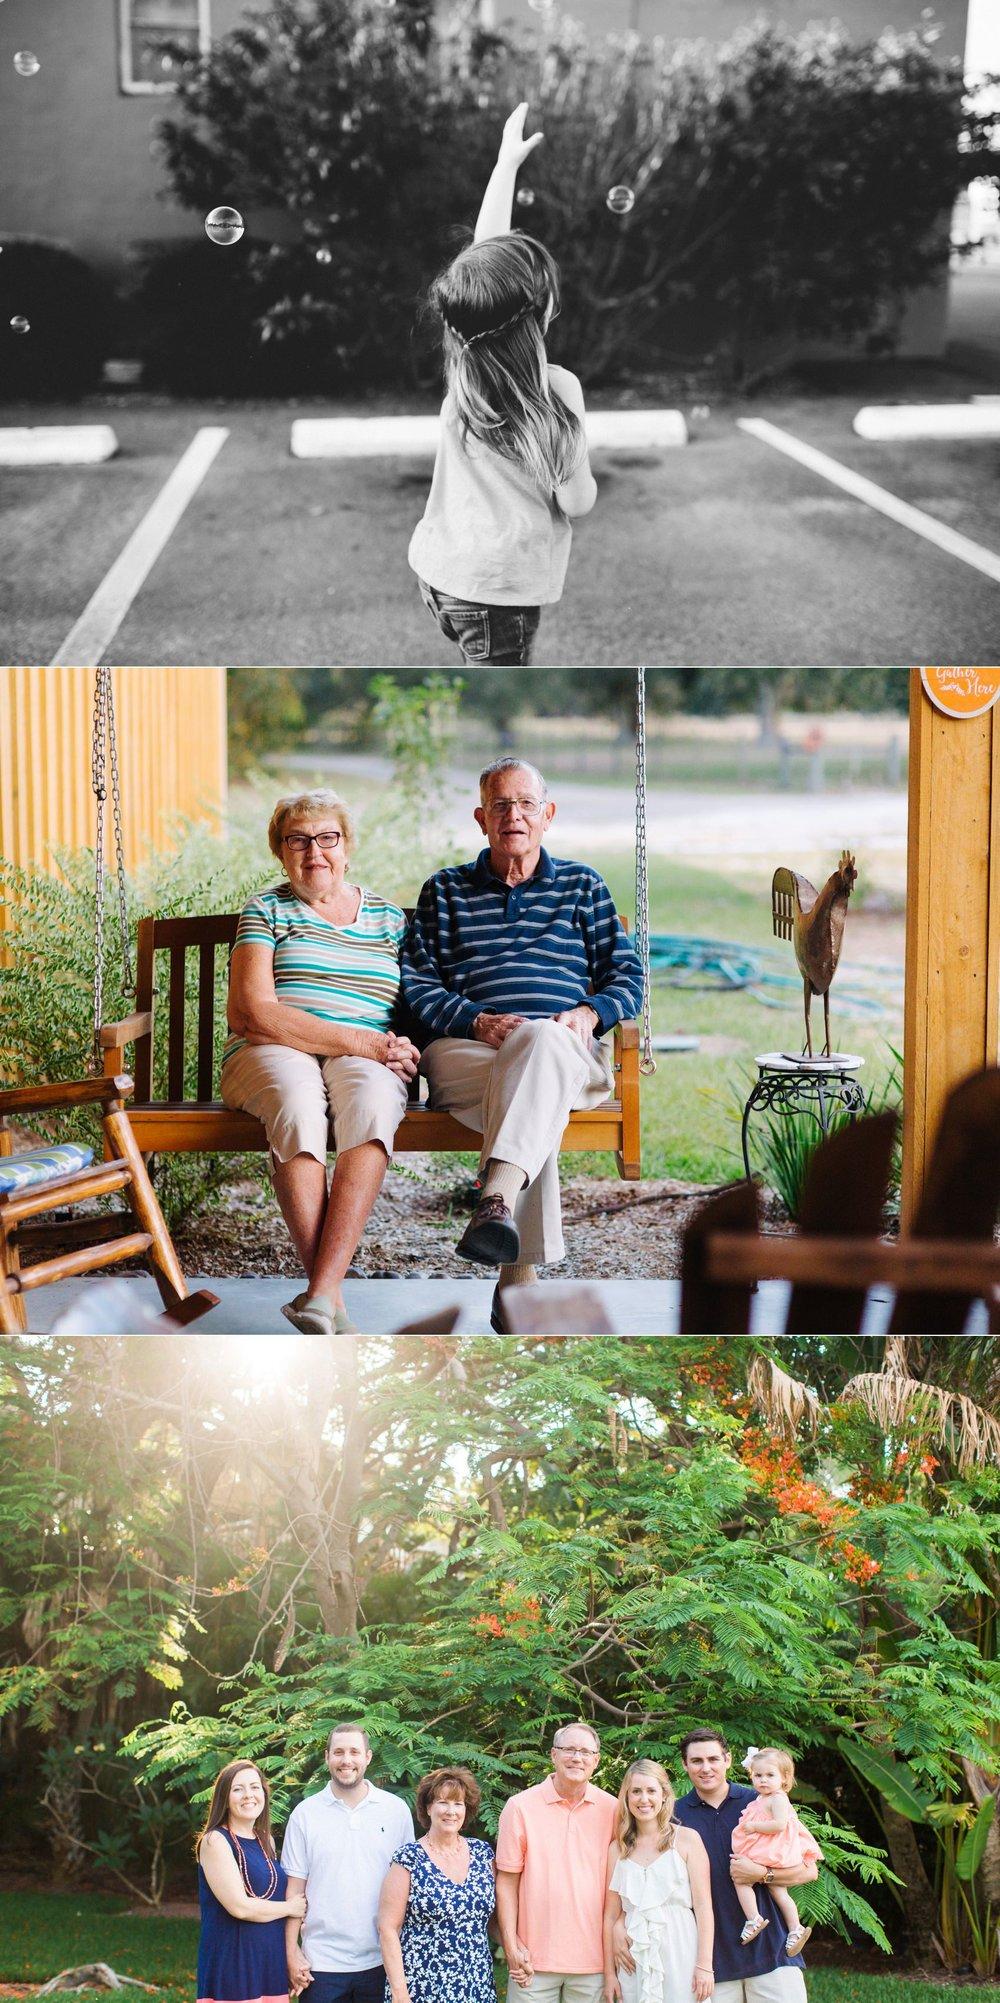 Jake & Katie's Best of Families 2016-032.jpg